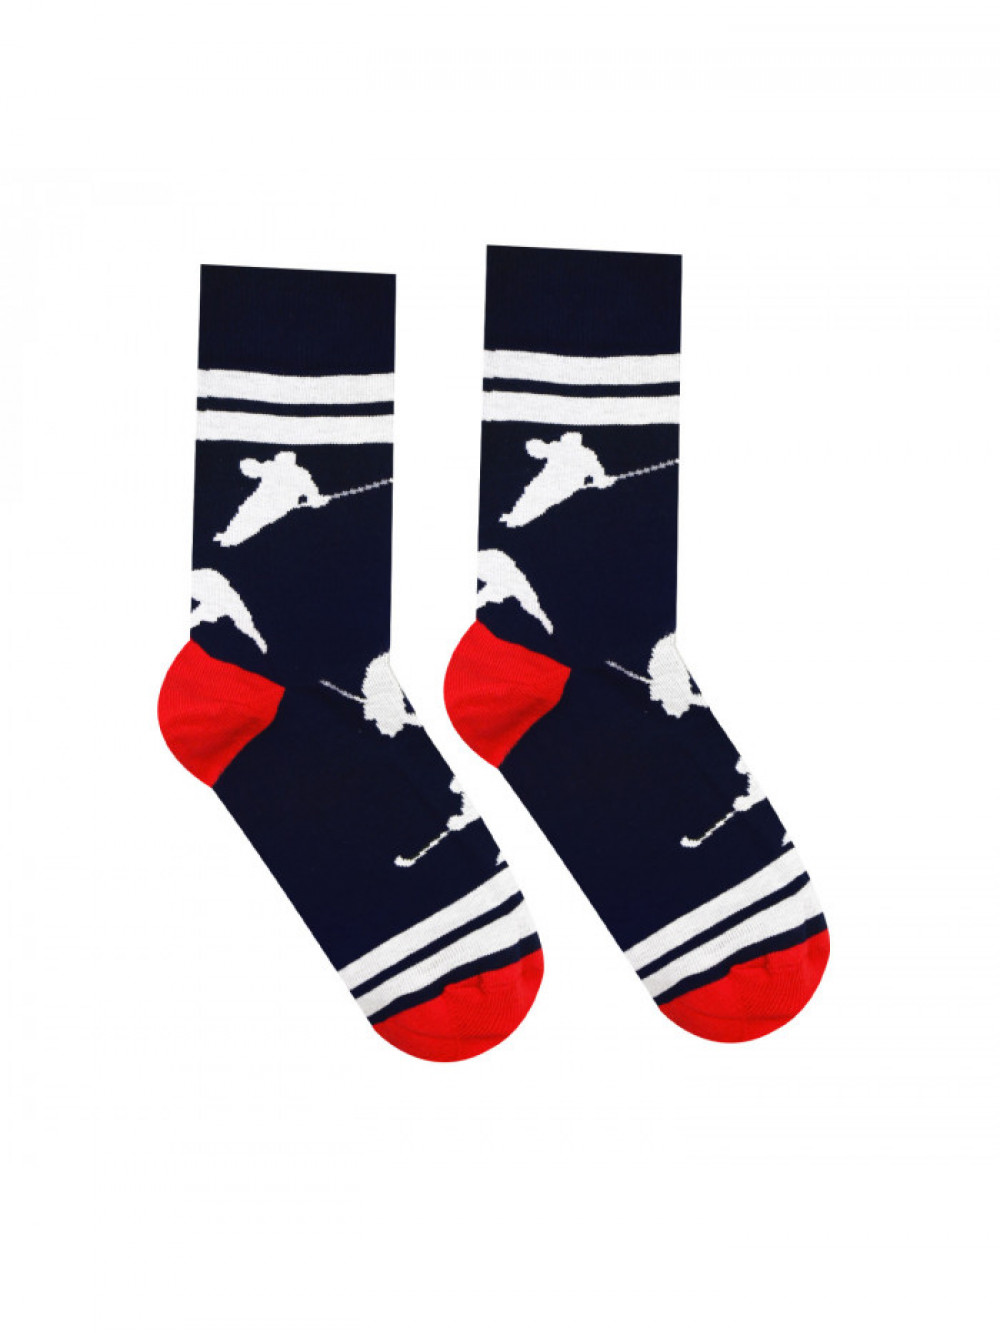 Zoknik Hesty Socks Jégkorong